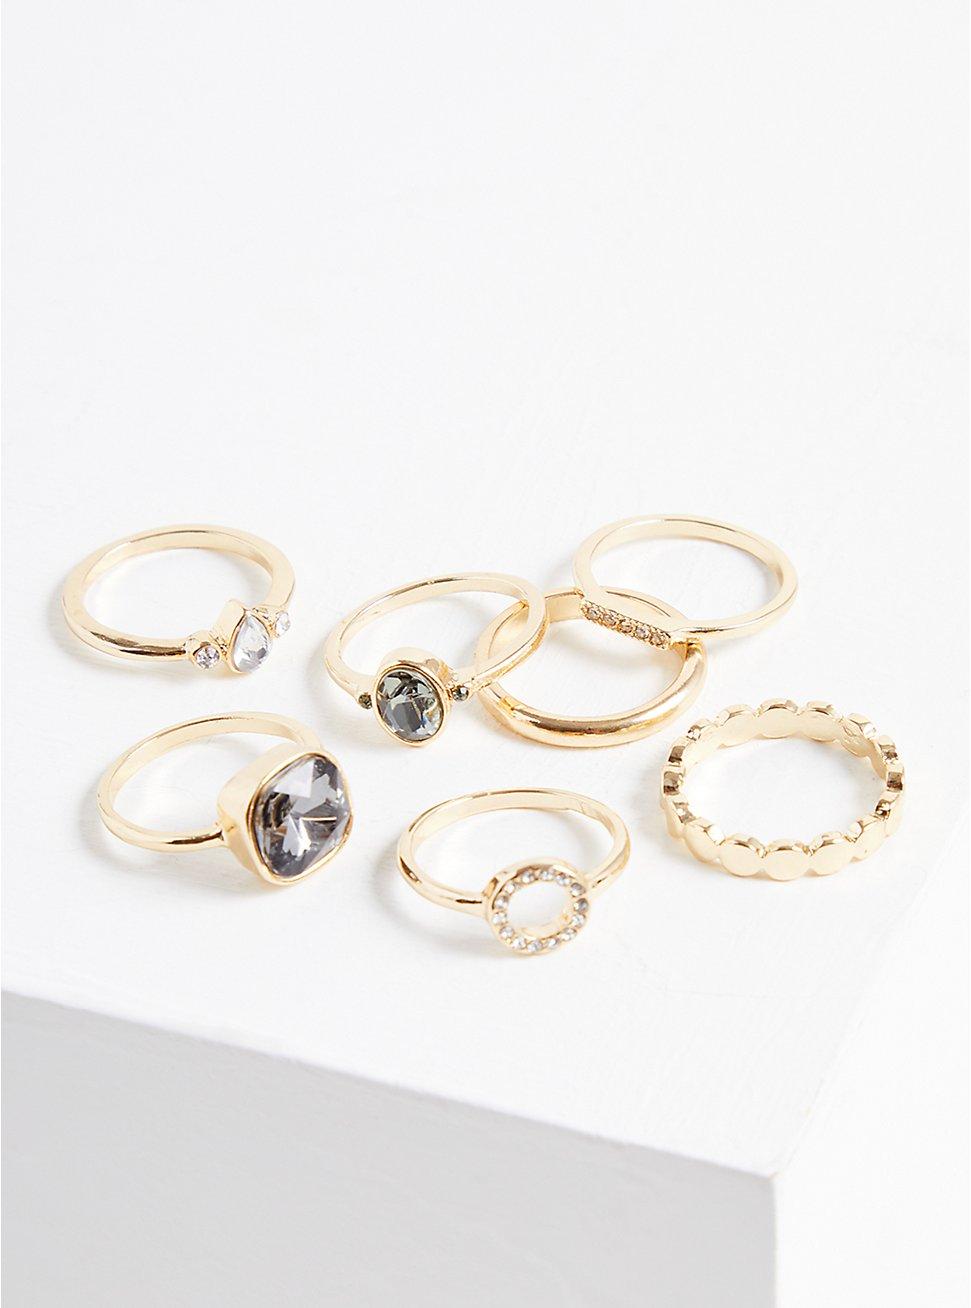 Stone Cocktail Ring Set Of 7 - Gold Tone, MULTI, hi-res